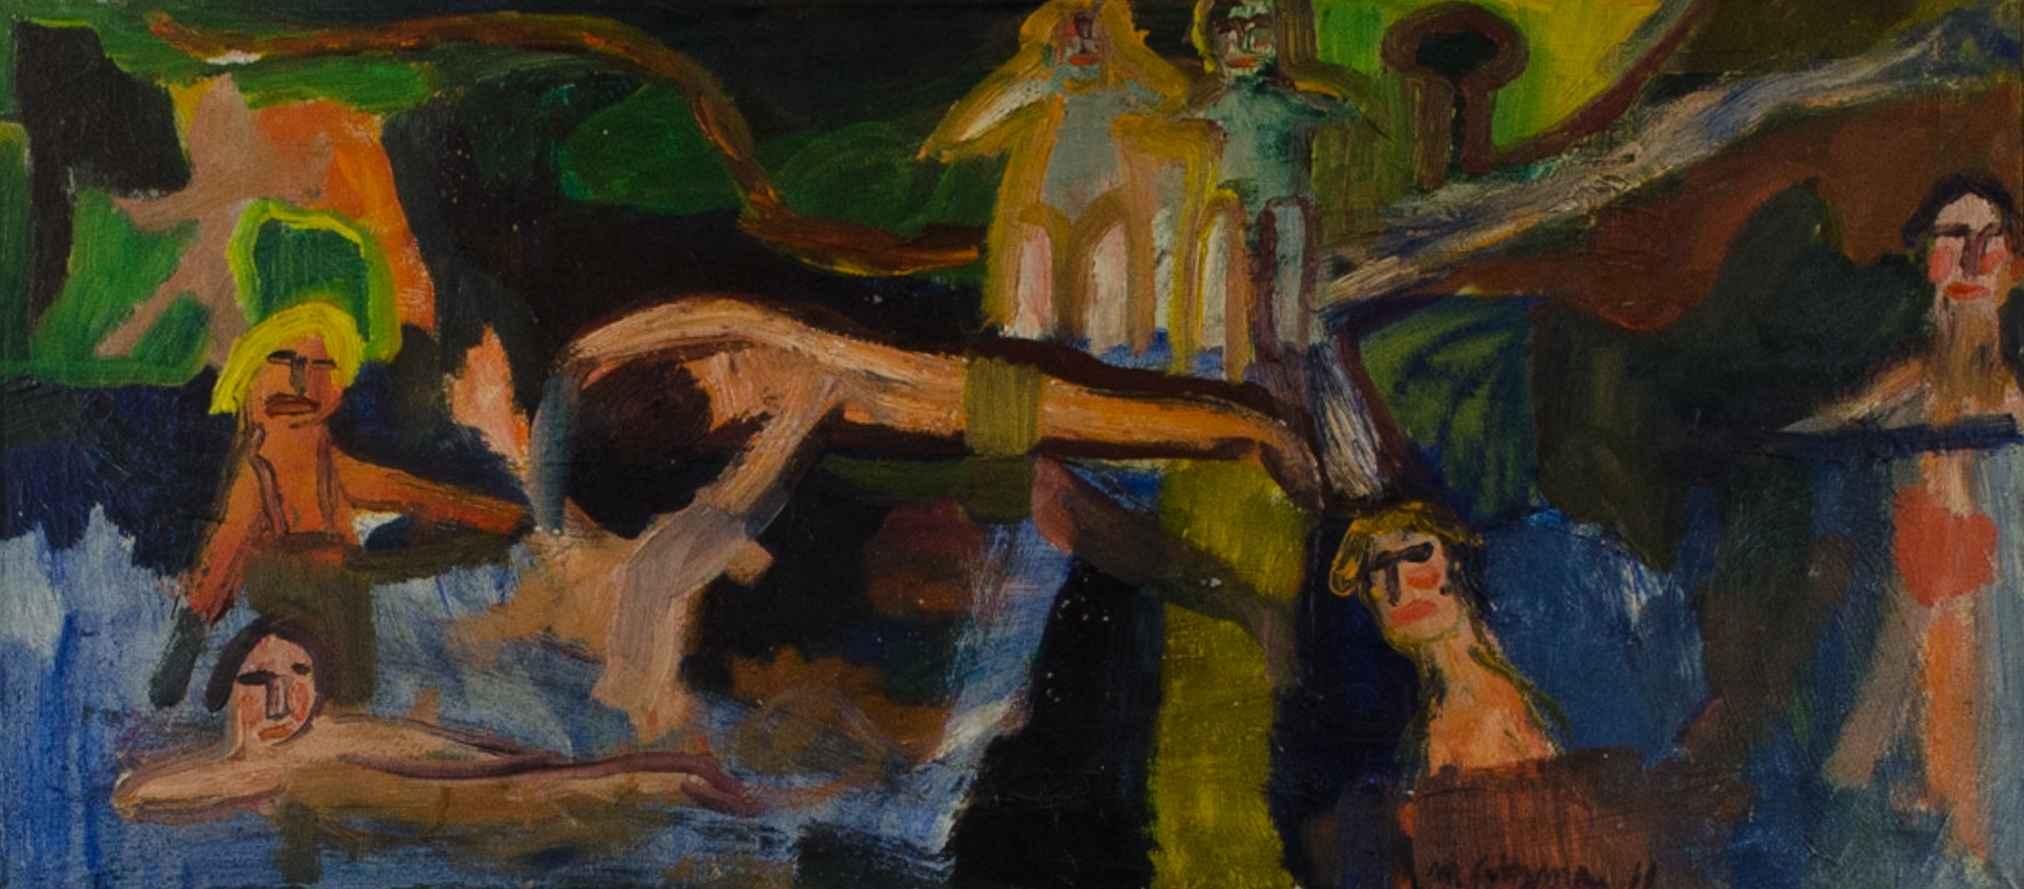 PRE-NORTH CAROLINA 19... by  Marvin Saltzman - Masterpiece Online